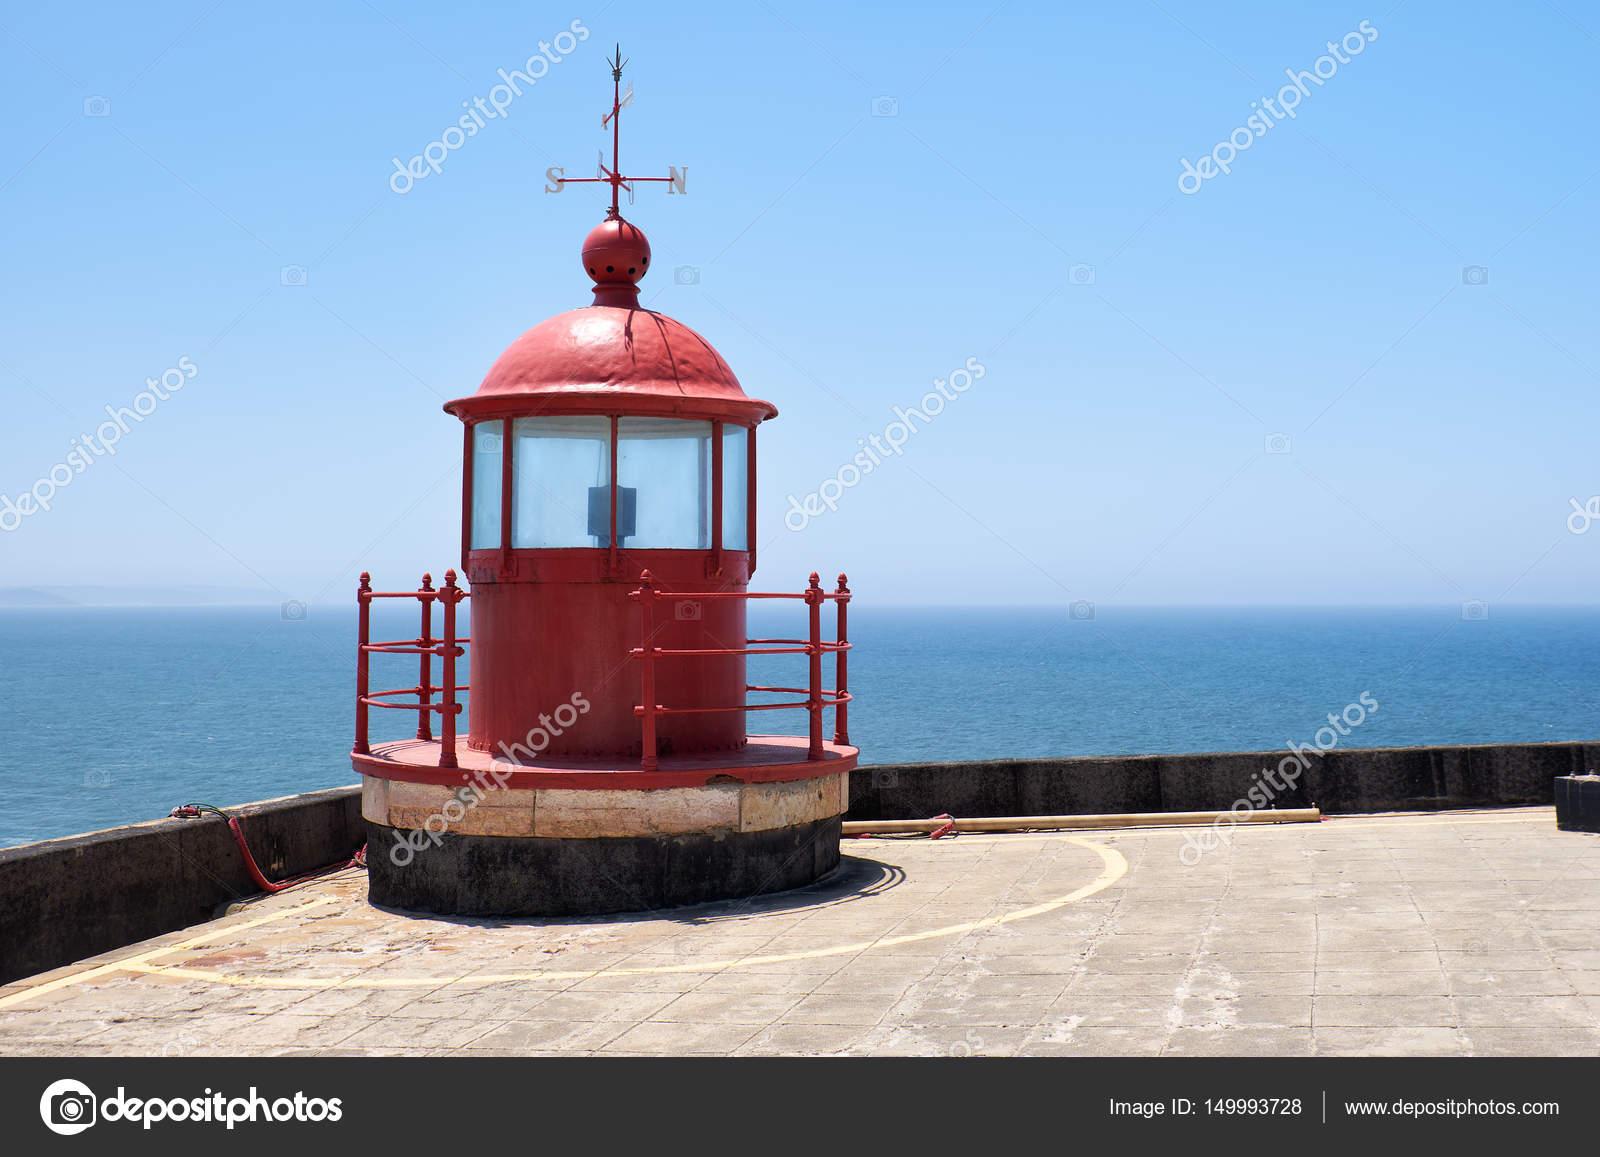 Rode vuurtoren lamp kamer op blauwe hemel en zee achtergrond in